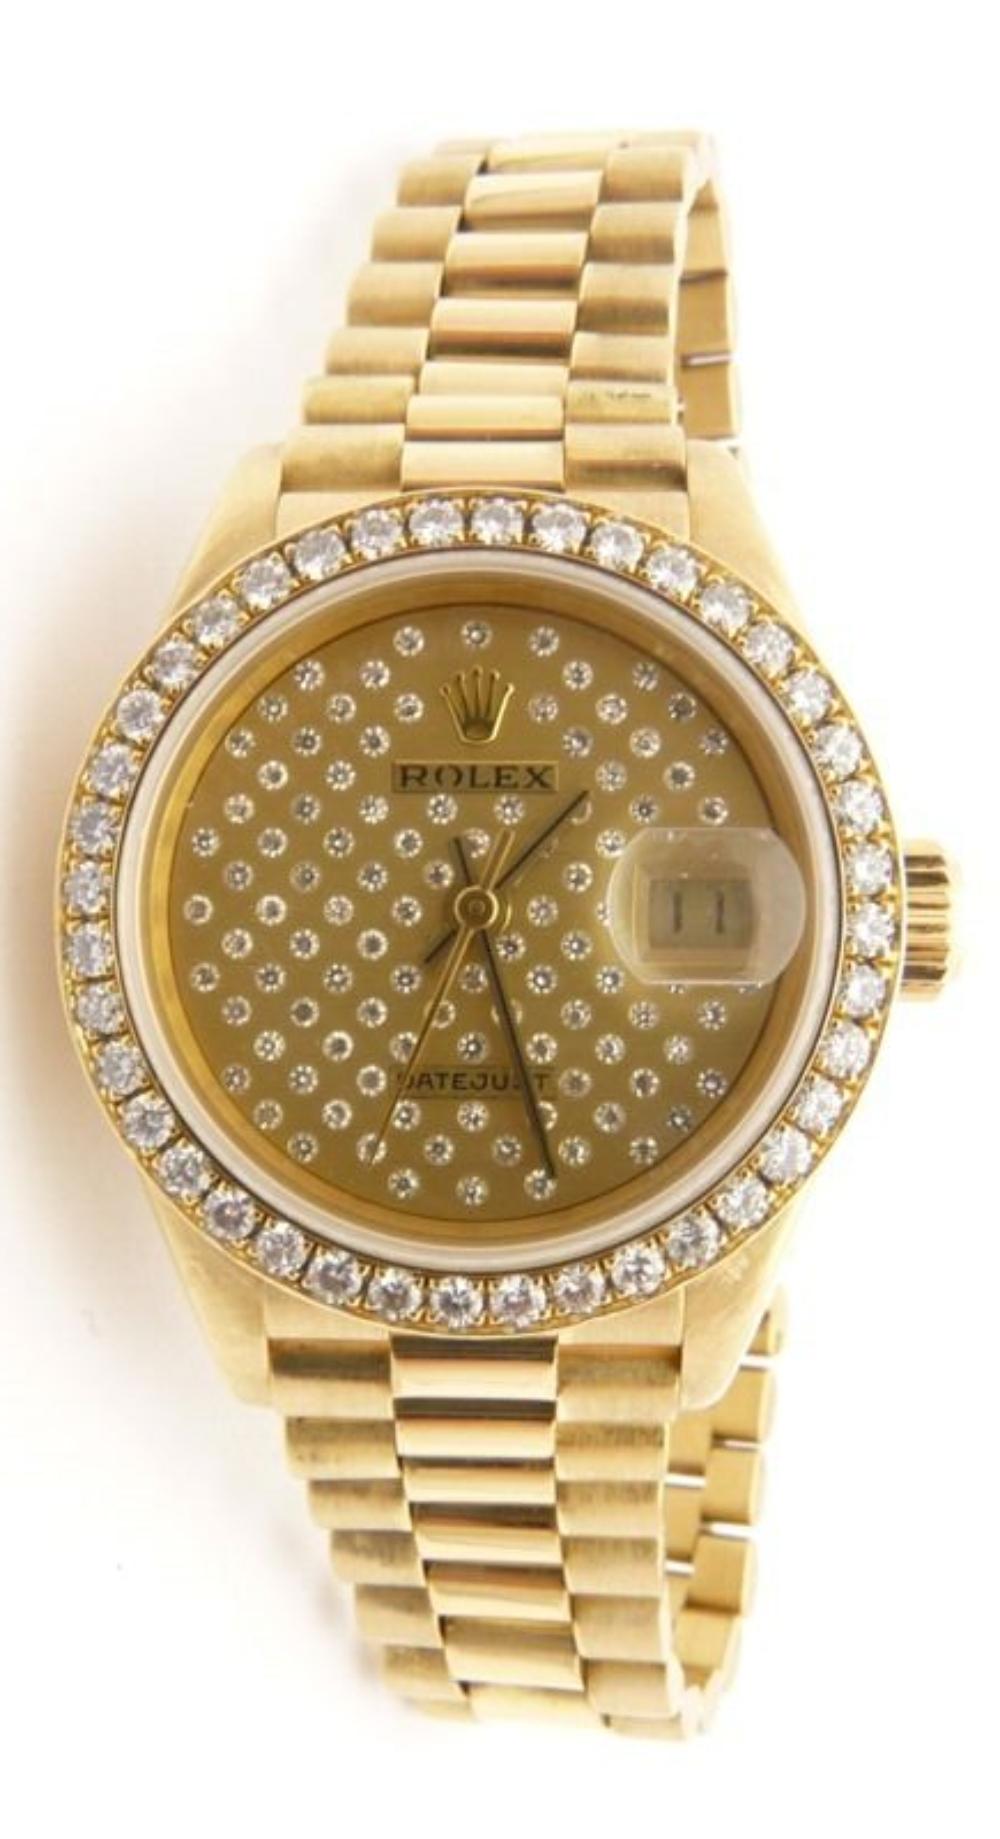 ROLEX 69178 Oyster Perpetual Datejust Pleiade President 26mm Ladies 18K Gold Diamond Watch